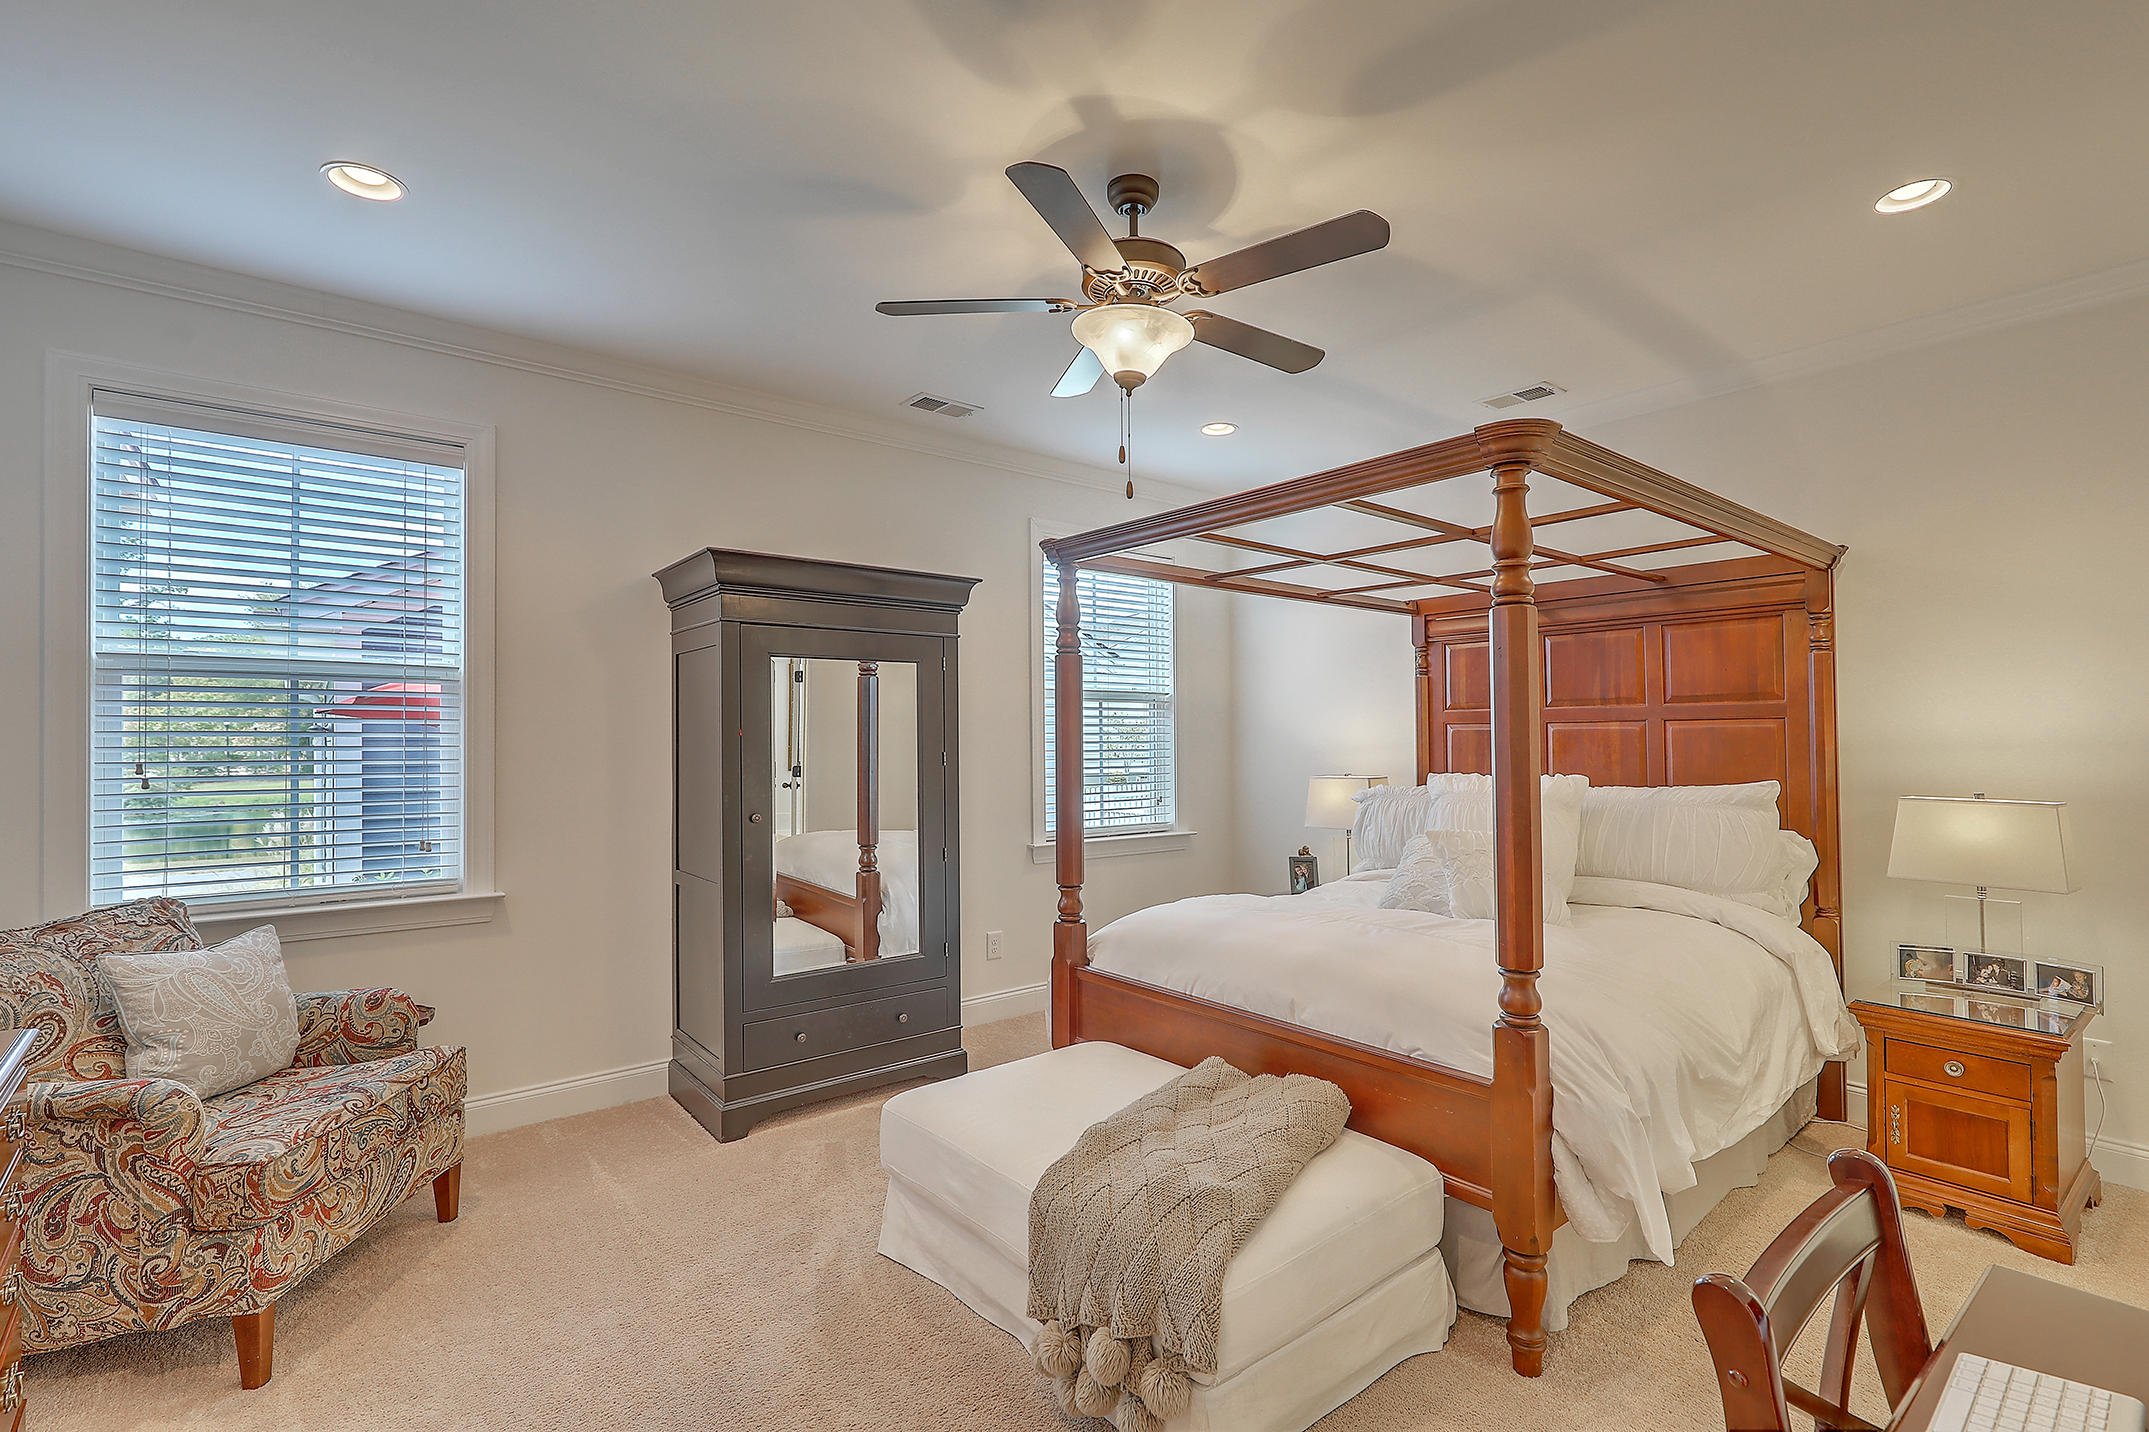 Park West Homes For Sale - 3412 Salterbeck, Mount Pleasant, SC - 13